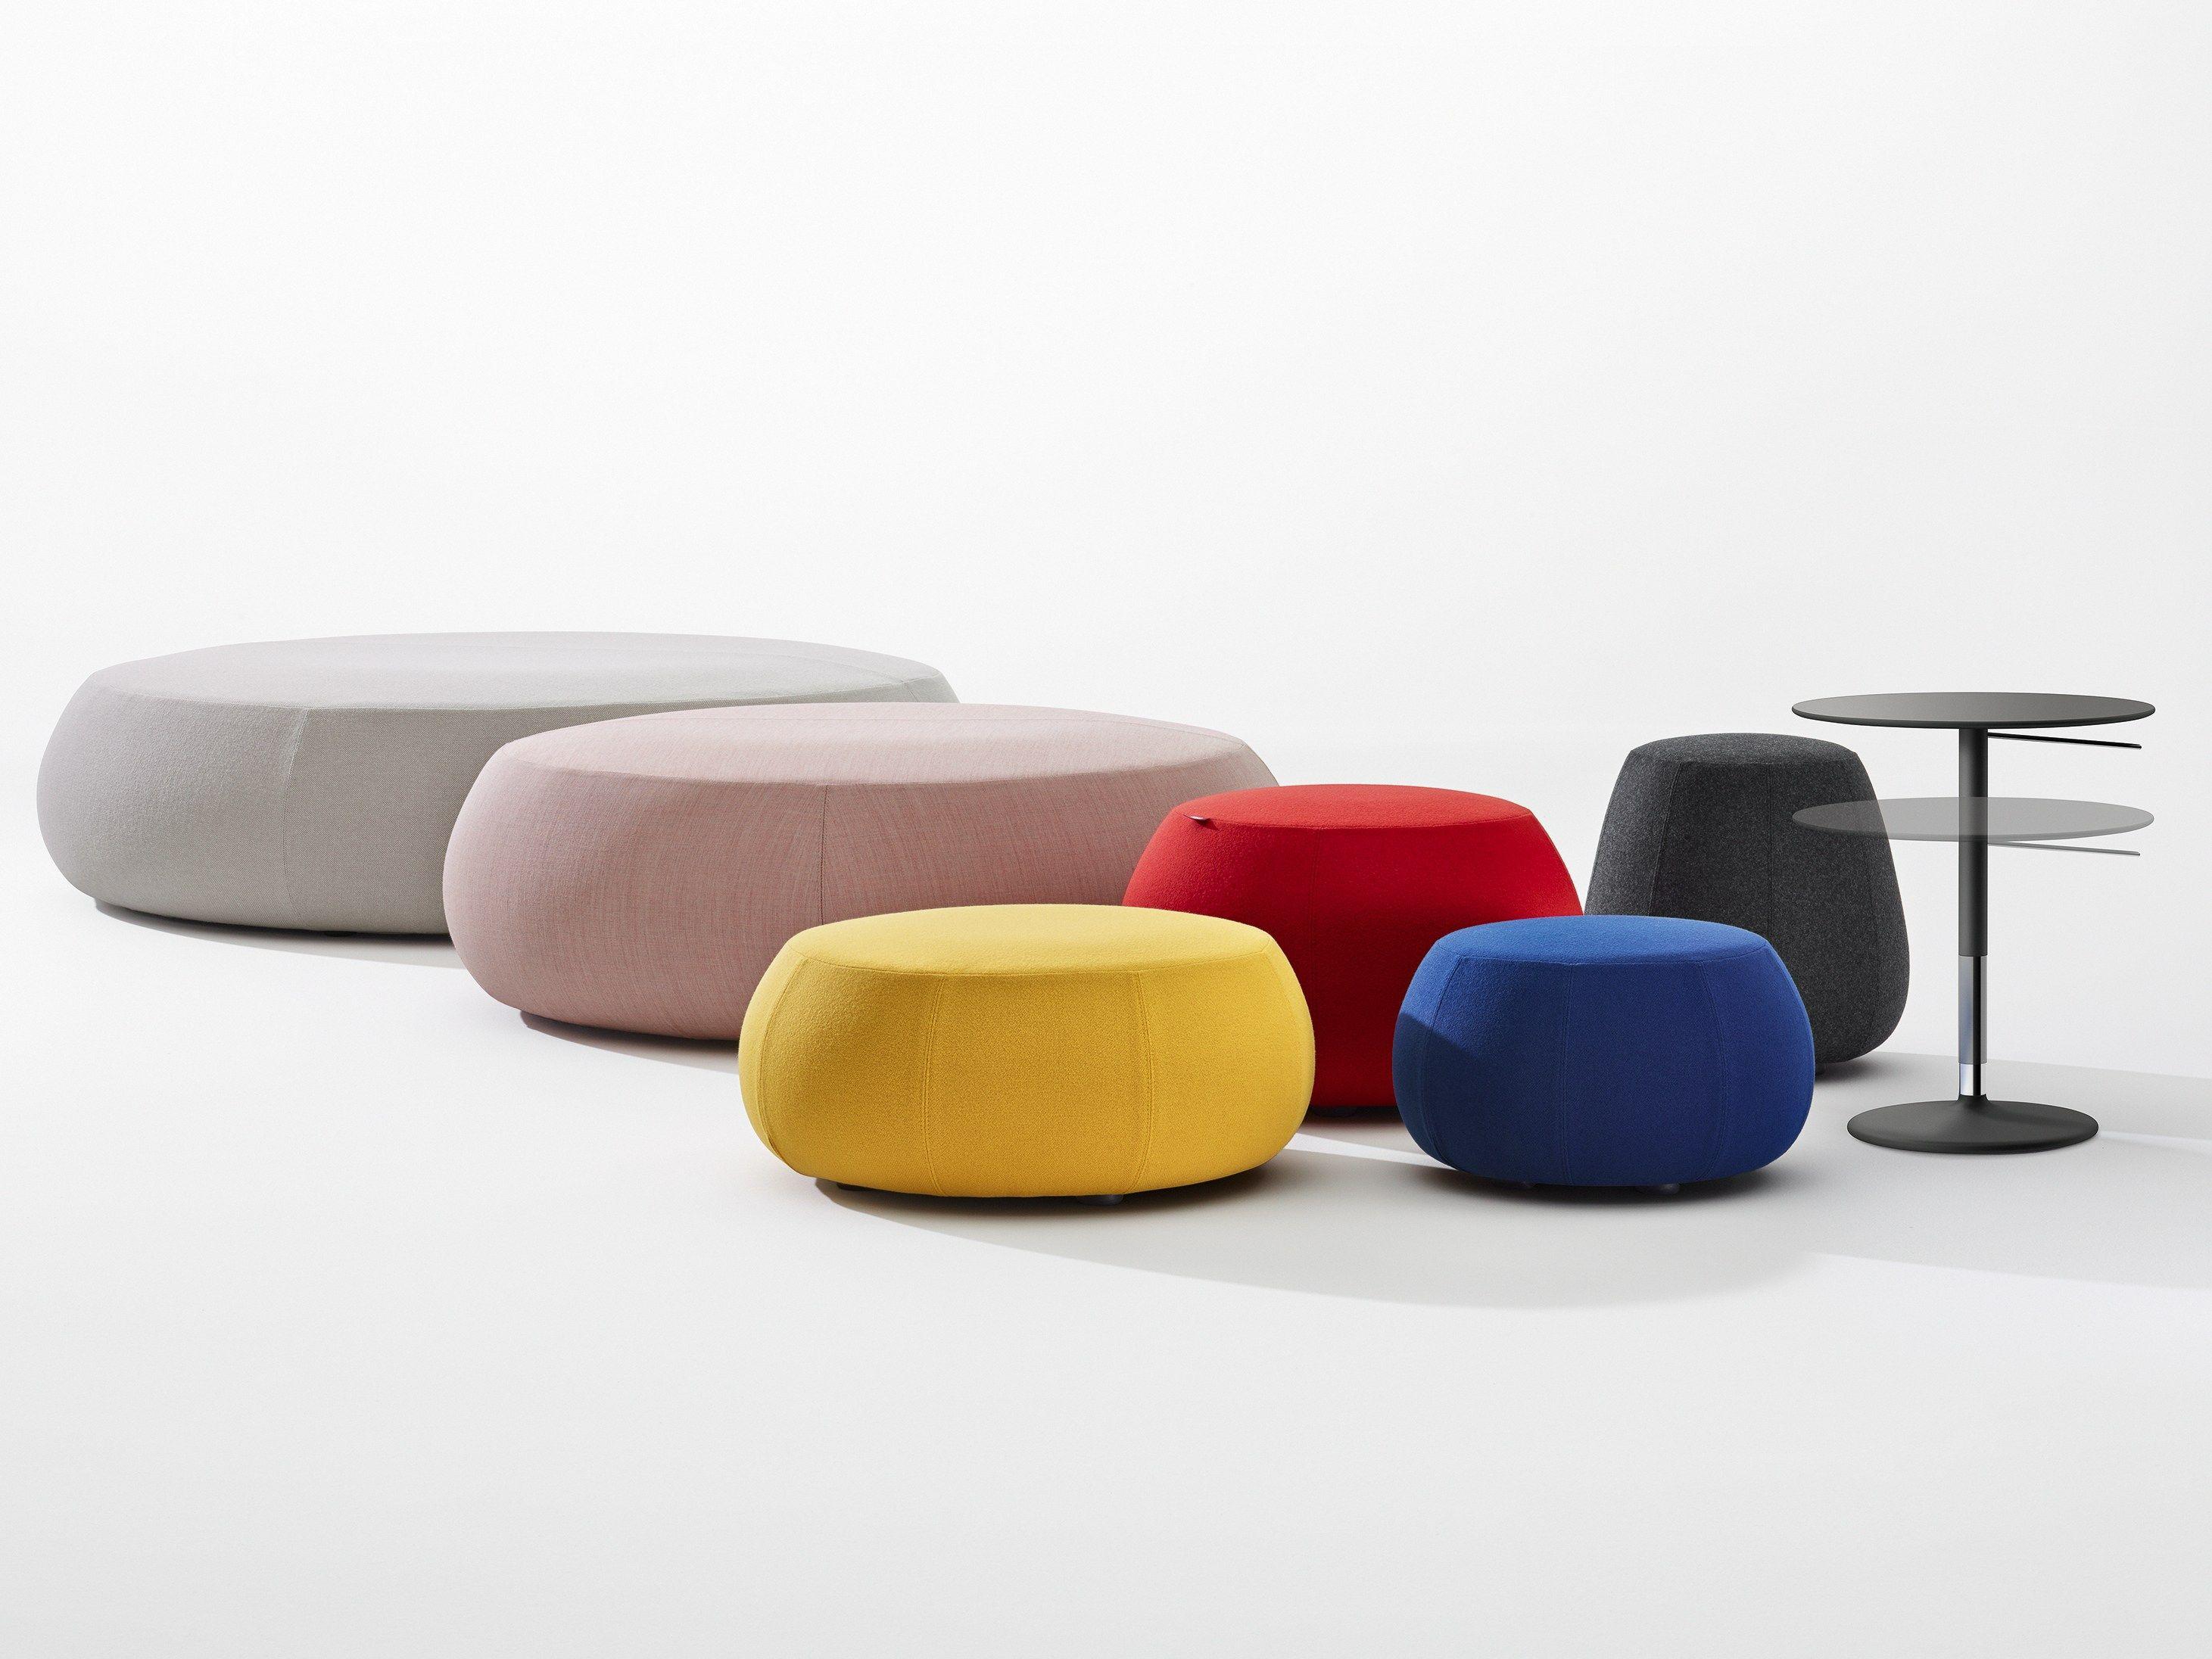 Upholstered Pouf Pix Mini By Arper Design Ichiro Iwasaki